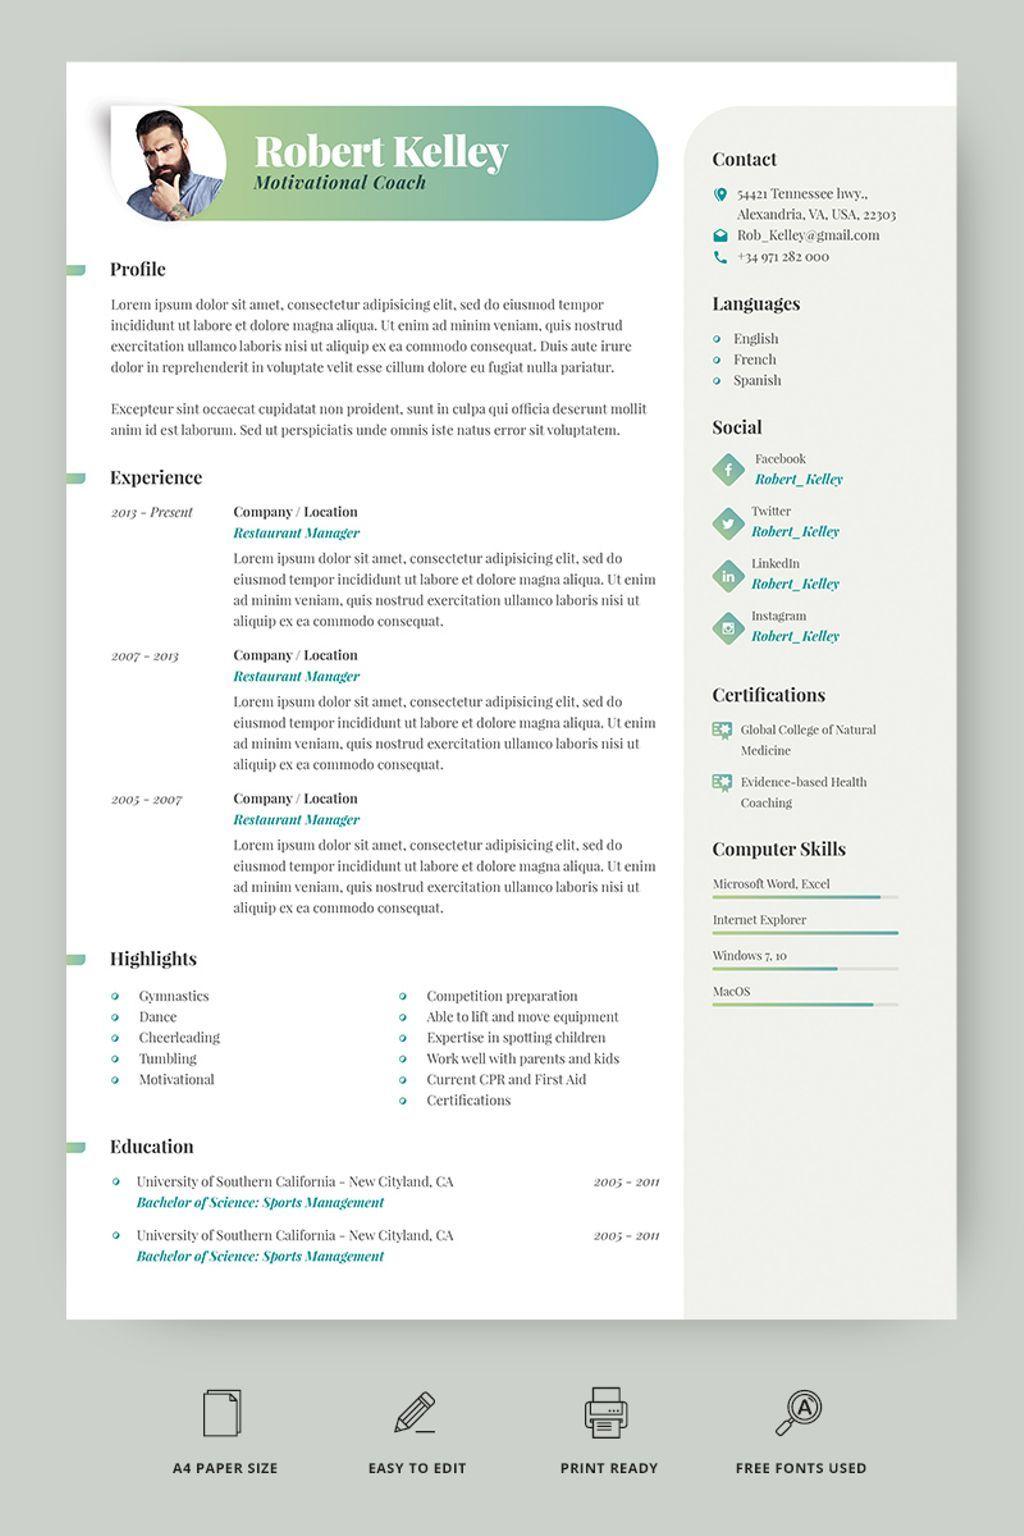 Robert Kelley Motivational Coach Resume Template 66773 Teacher Resume Template Resume Template Resume Design